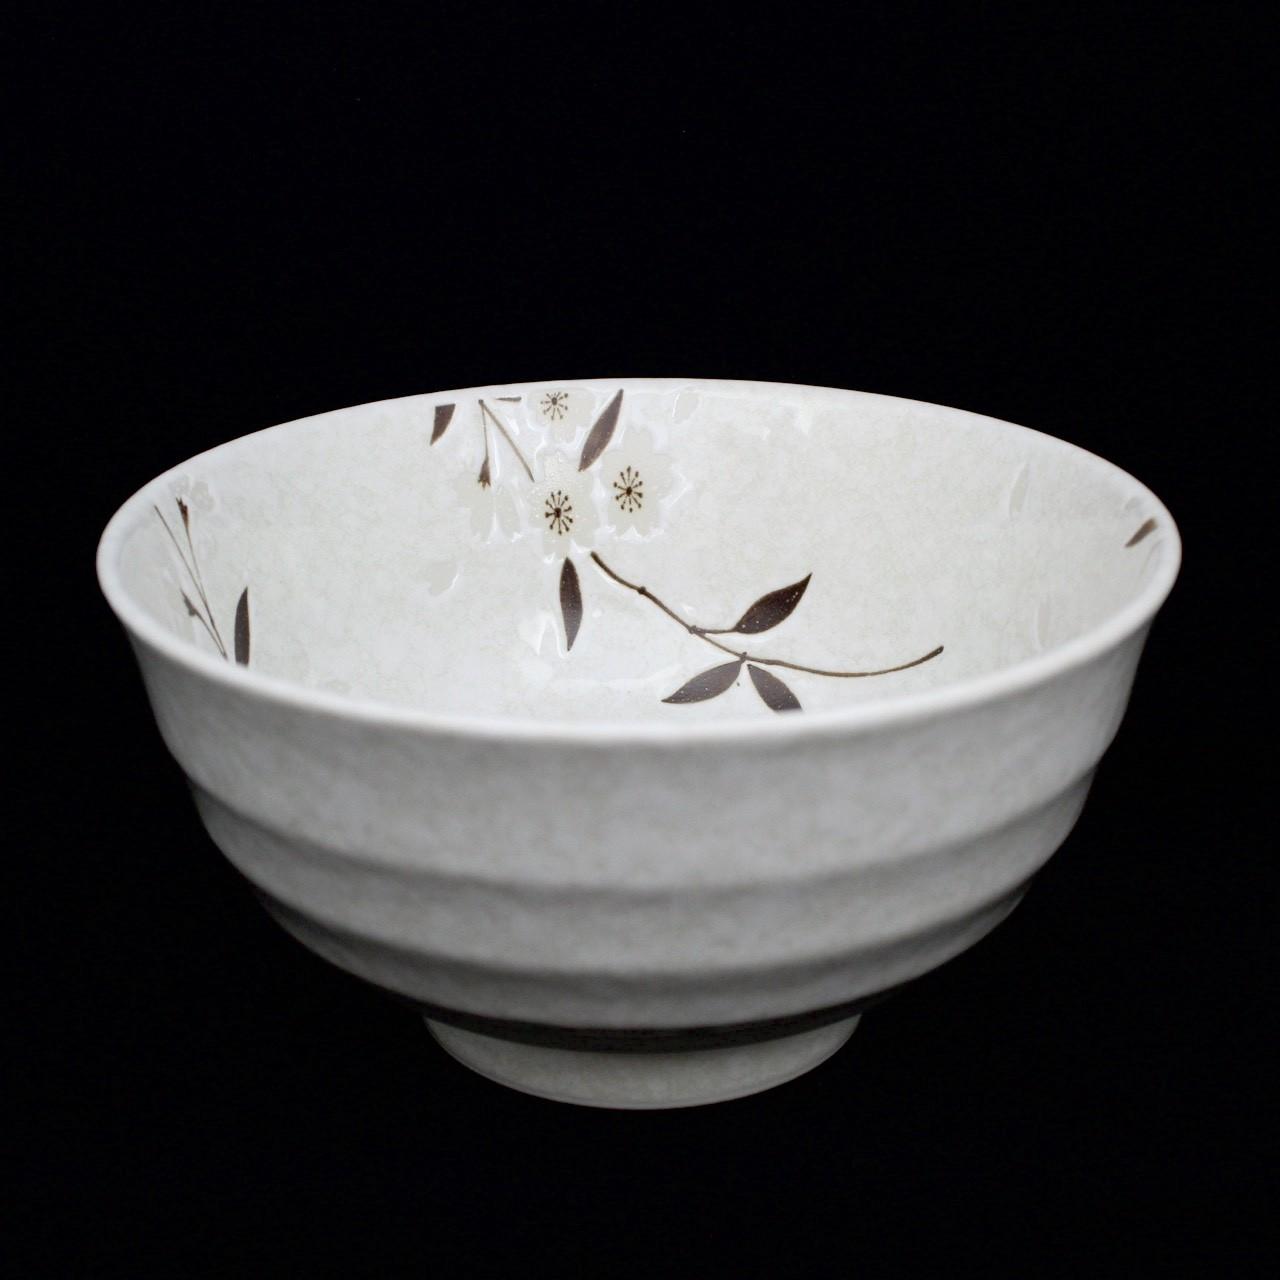 SHIRAYUKI SAKURA TIGELA 16.8X8.8cm 576g